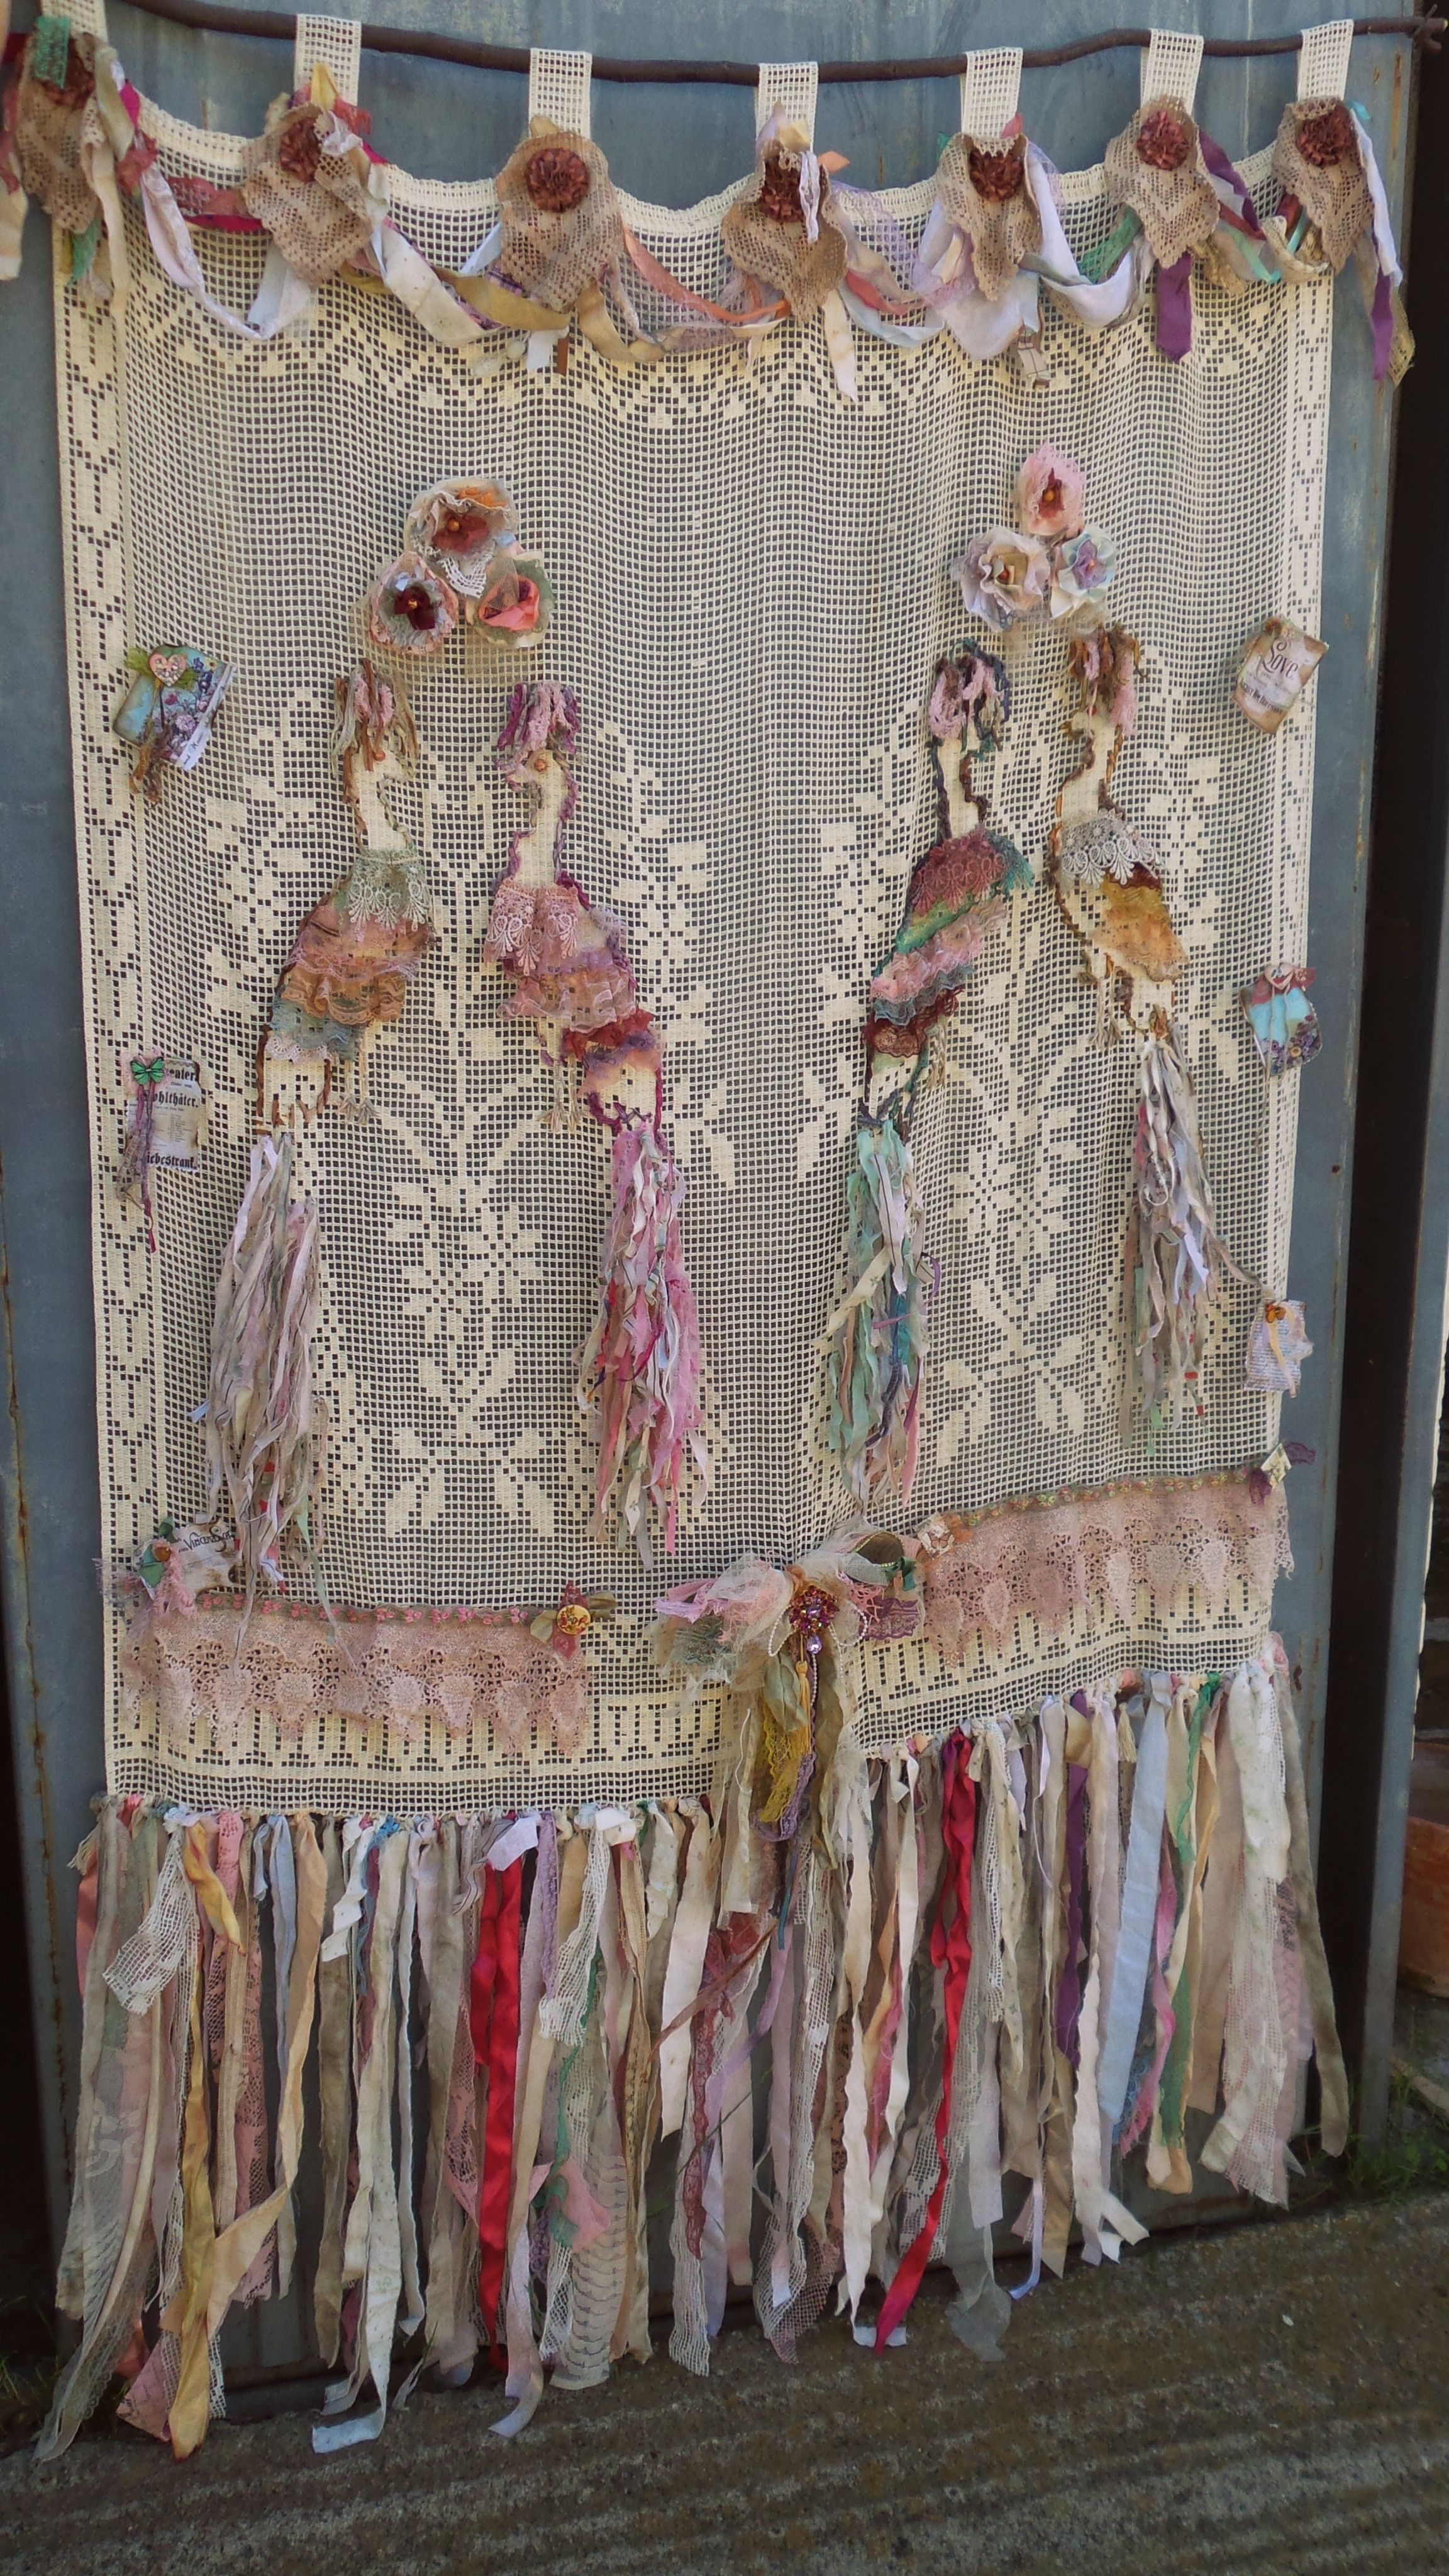 Macrame Wall Hanging Boho Chic Tapestry Decor